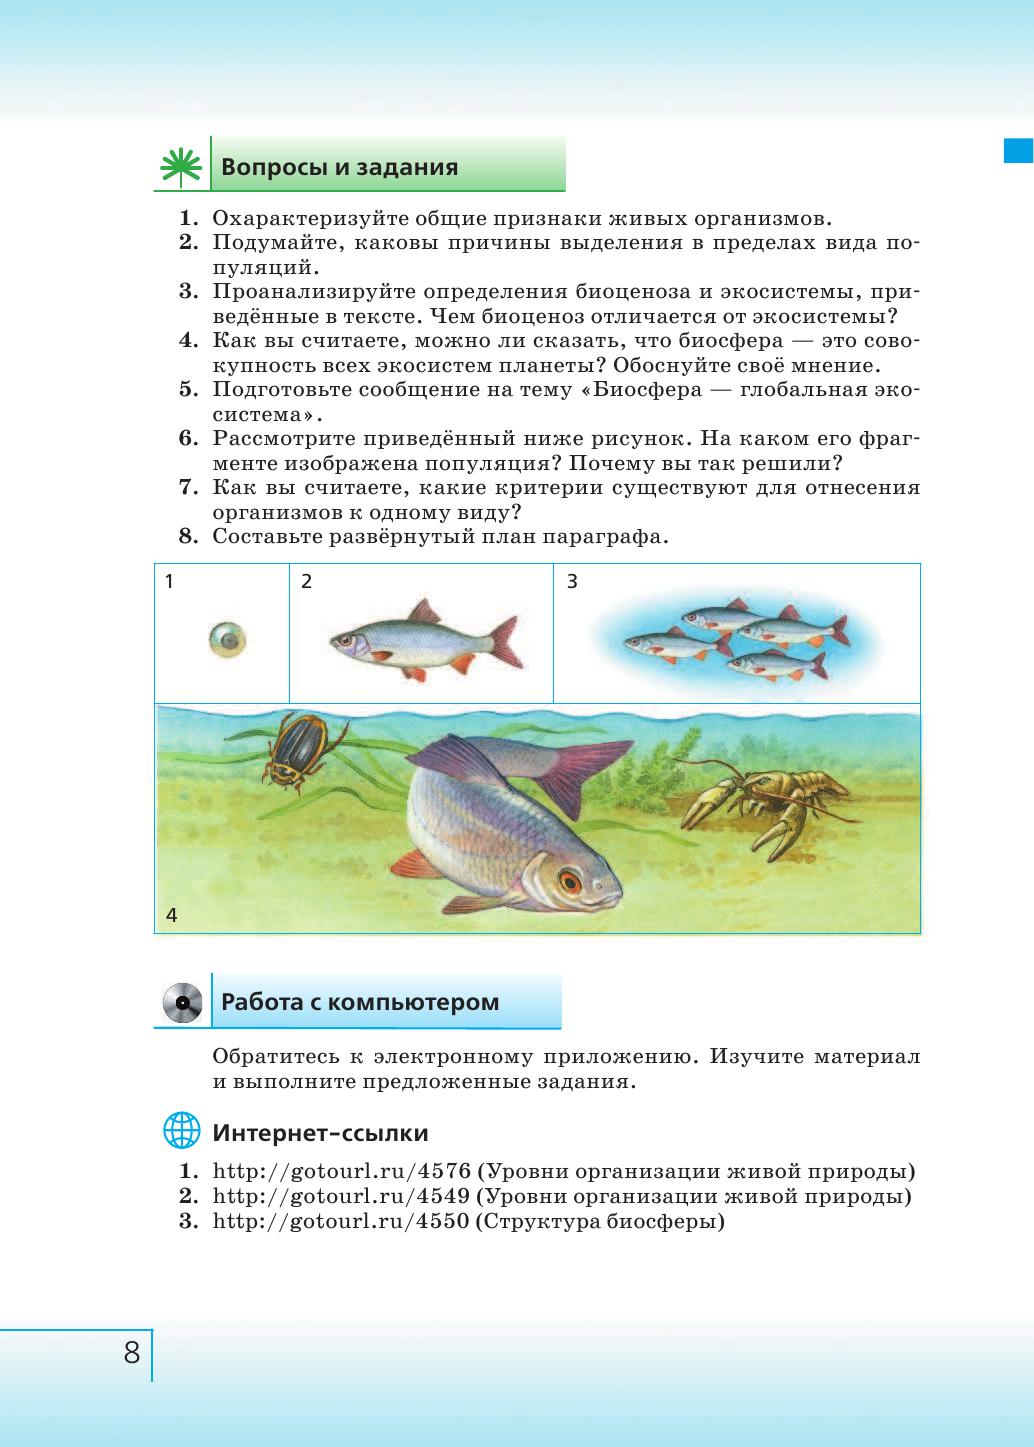 биология бактерии грибы растения 6 класс